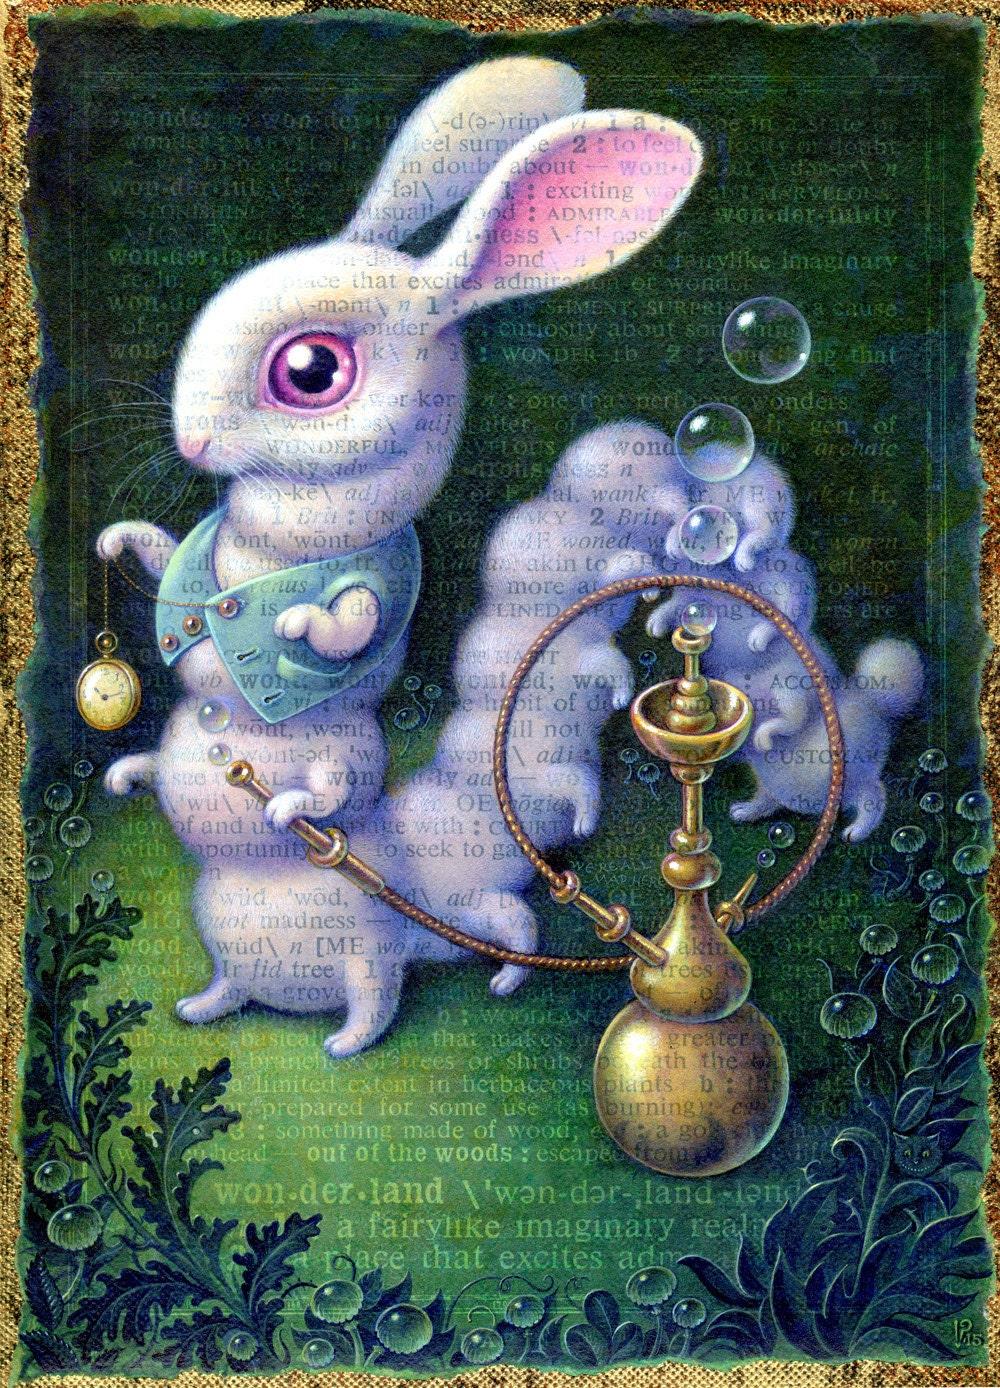 White Rabbit art print 7.5x10 Surreal Wonderland Rabbit/